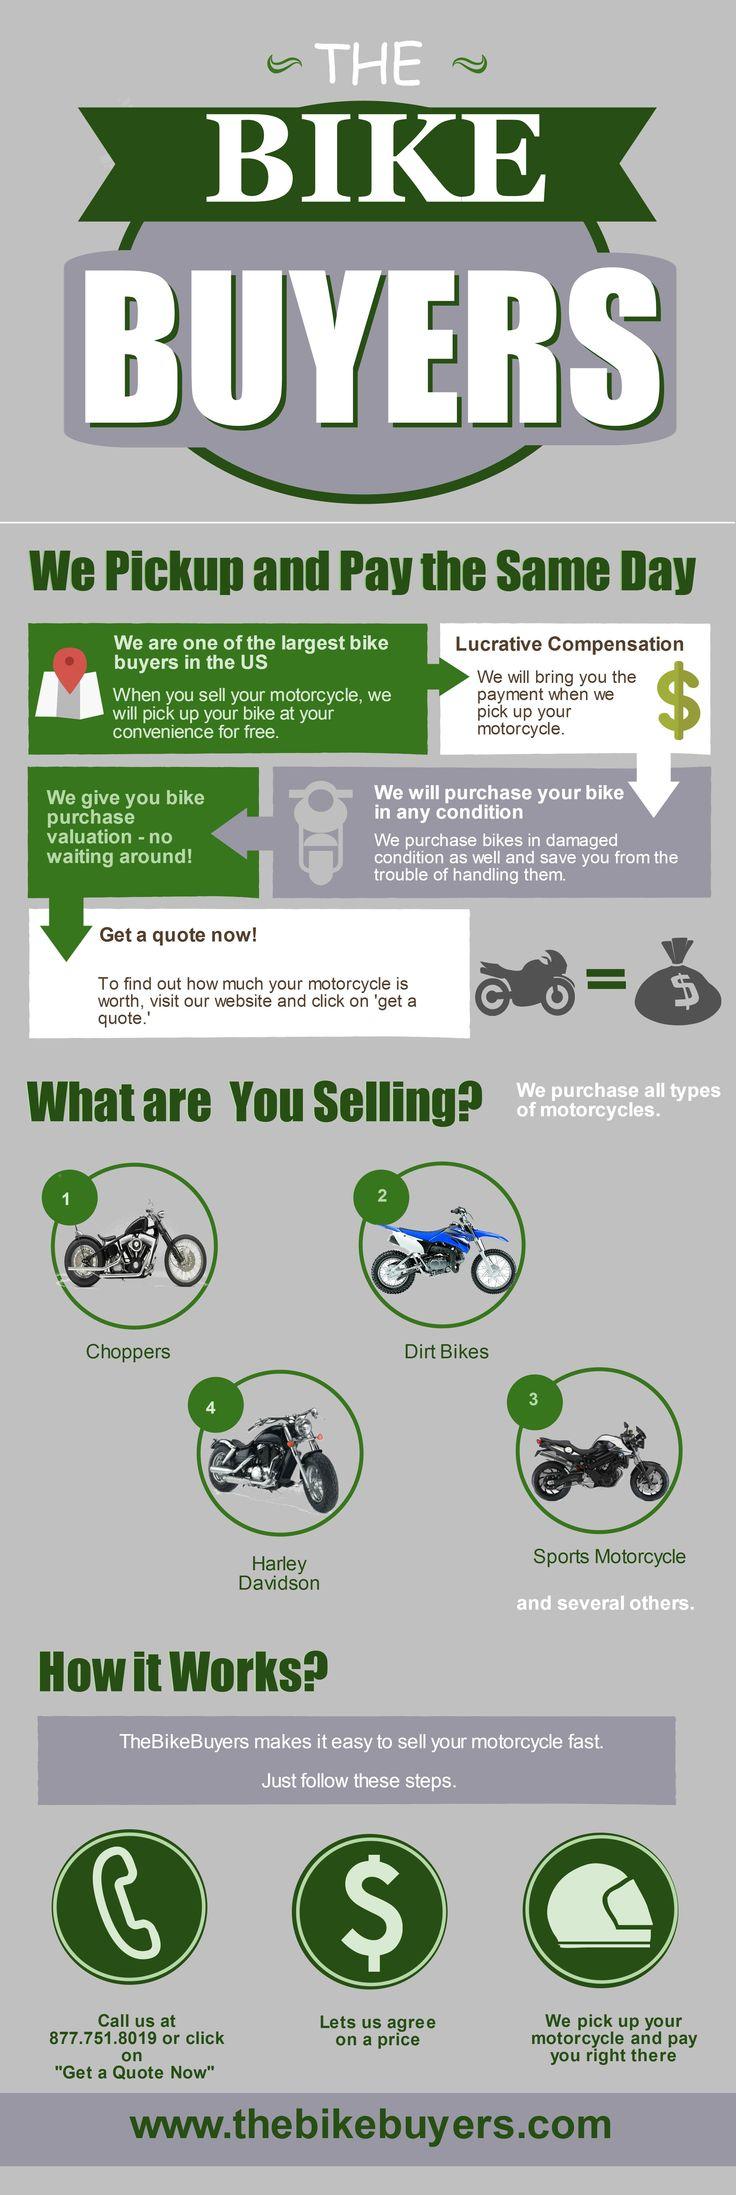 25 Best Ideas About Buy Bmw On Pinterest Bmw Motorbikes